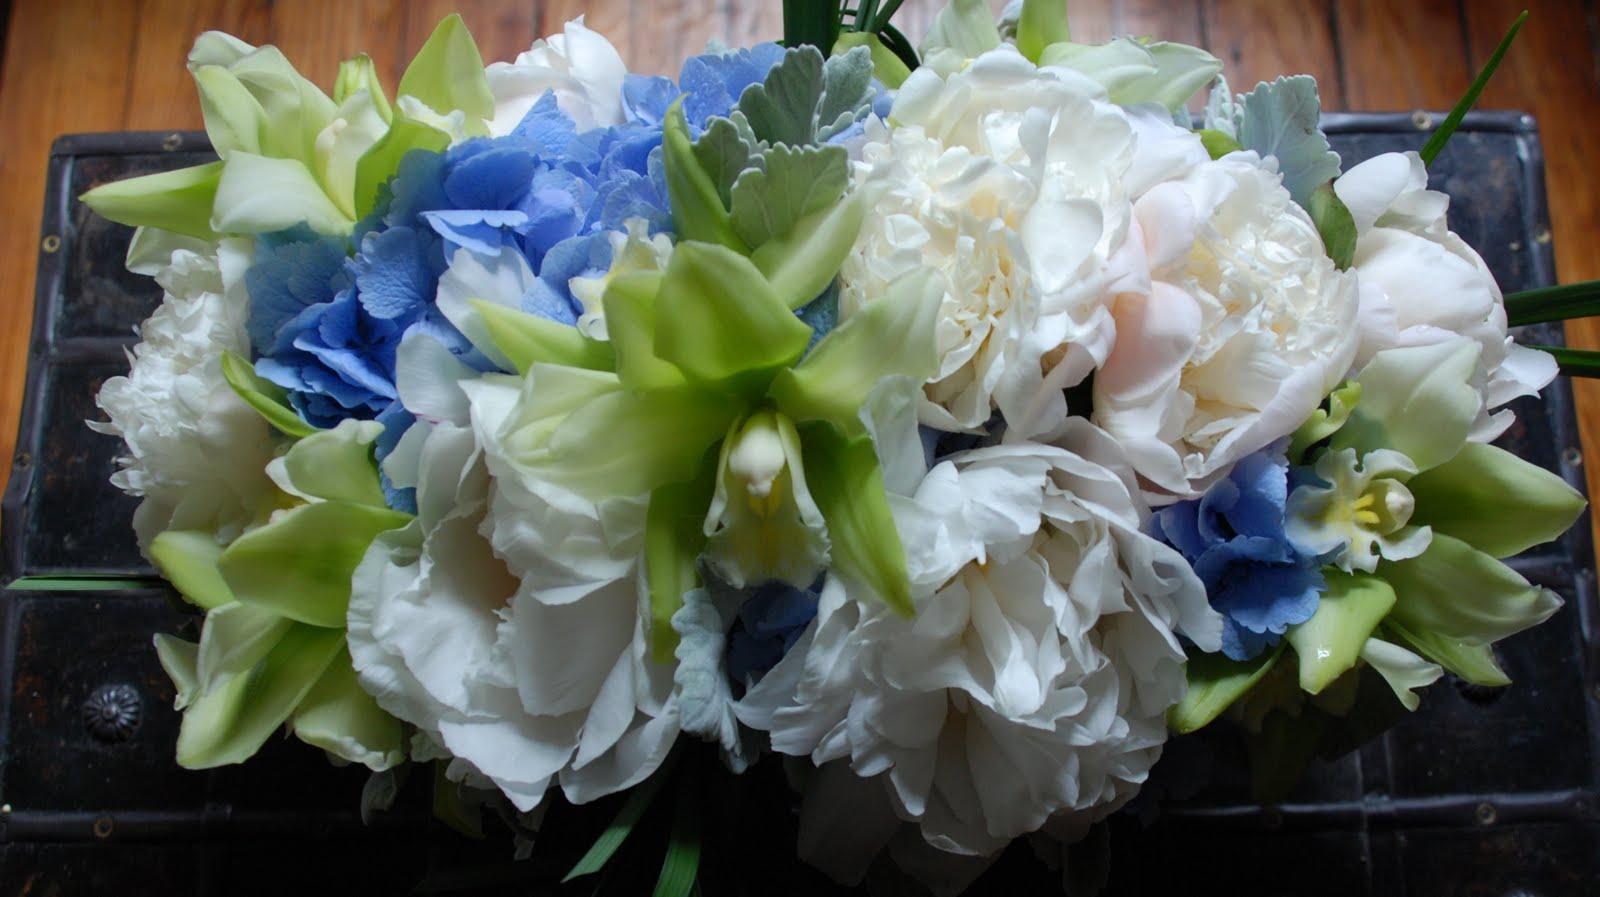 White Peonies Blue Hydrangea And Lemon Lime Cymbidium Orchids